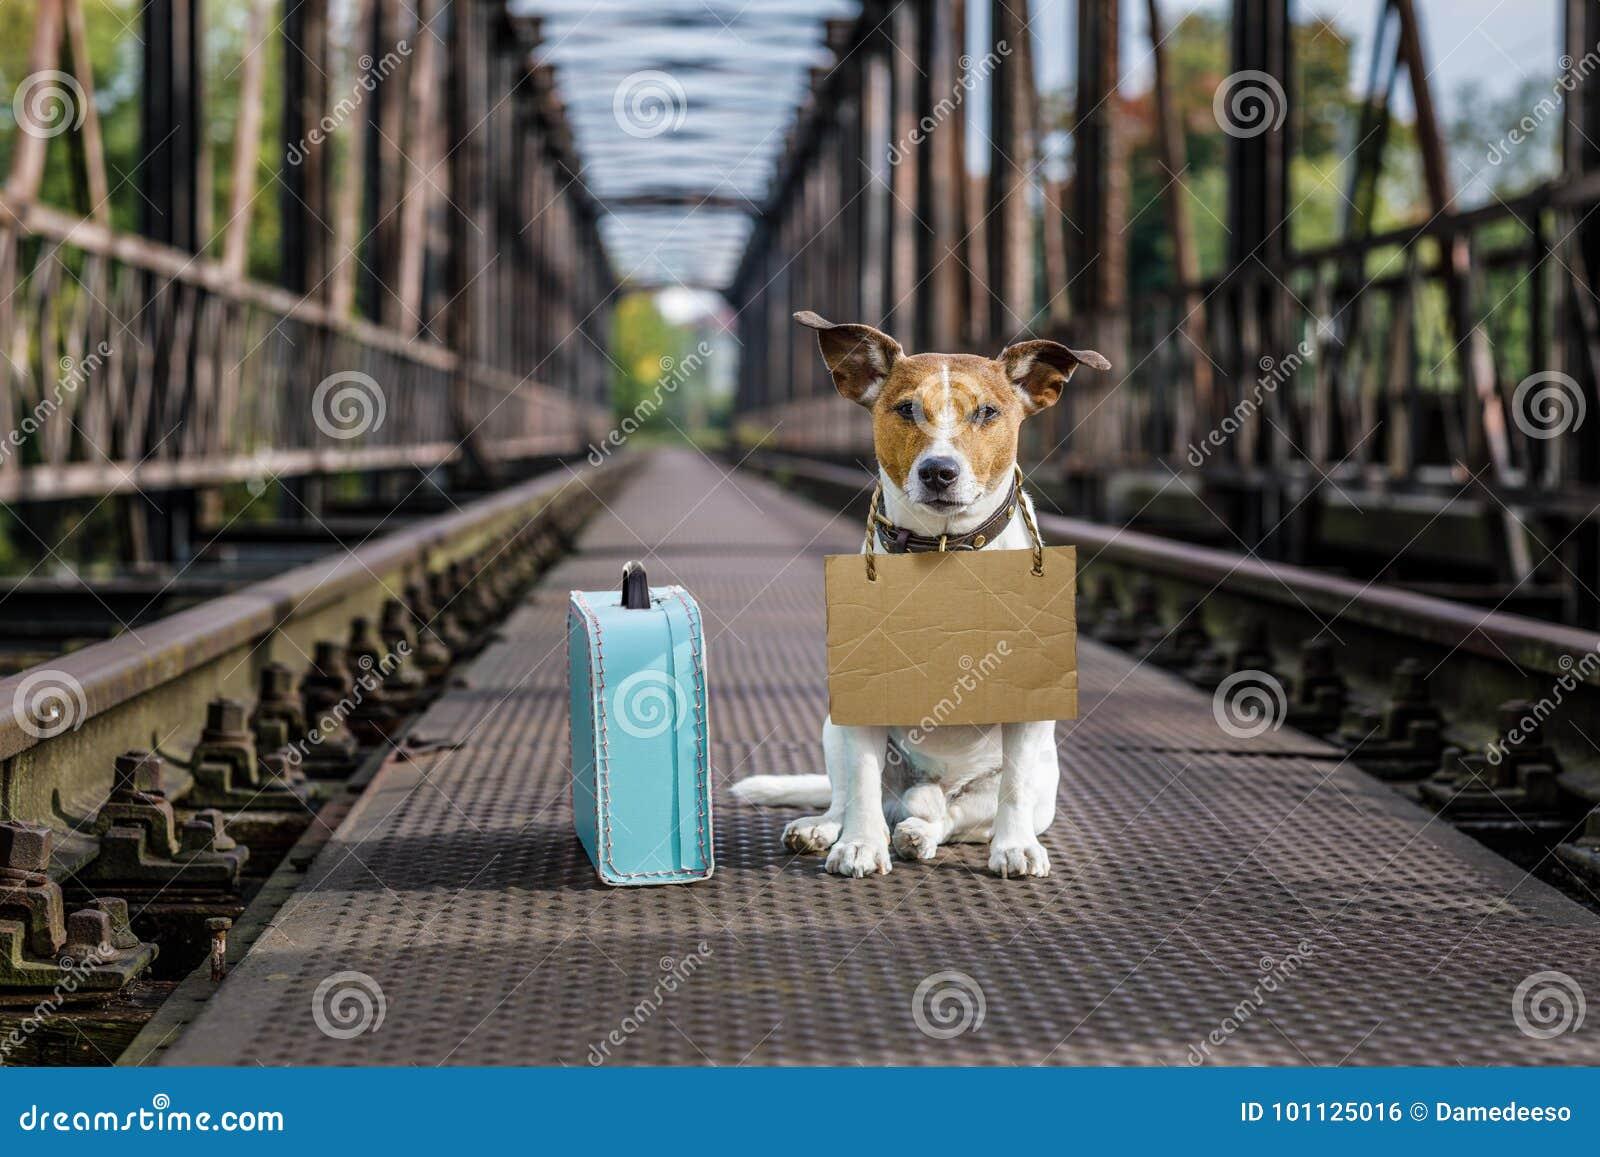 Verloren en daklozen verlaten hond